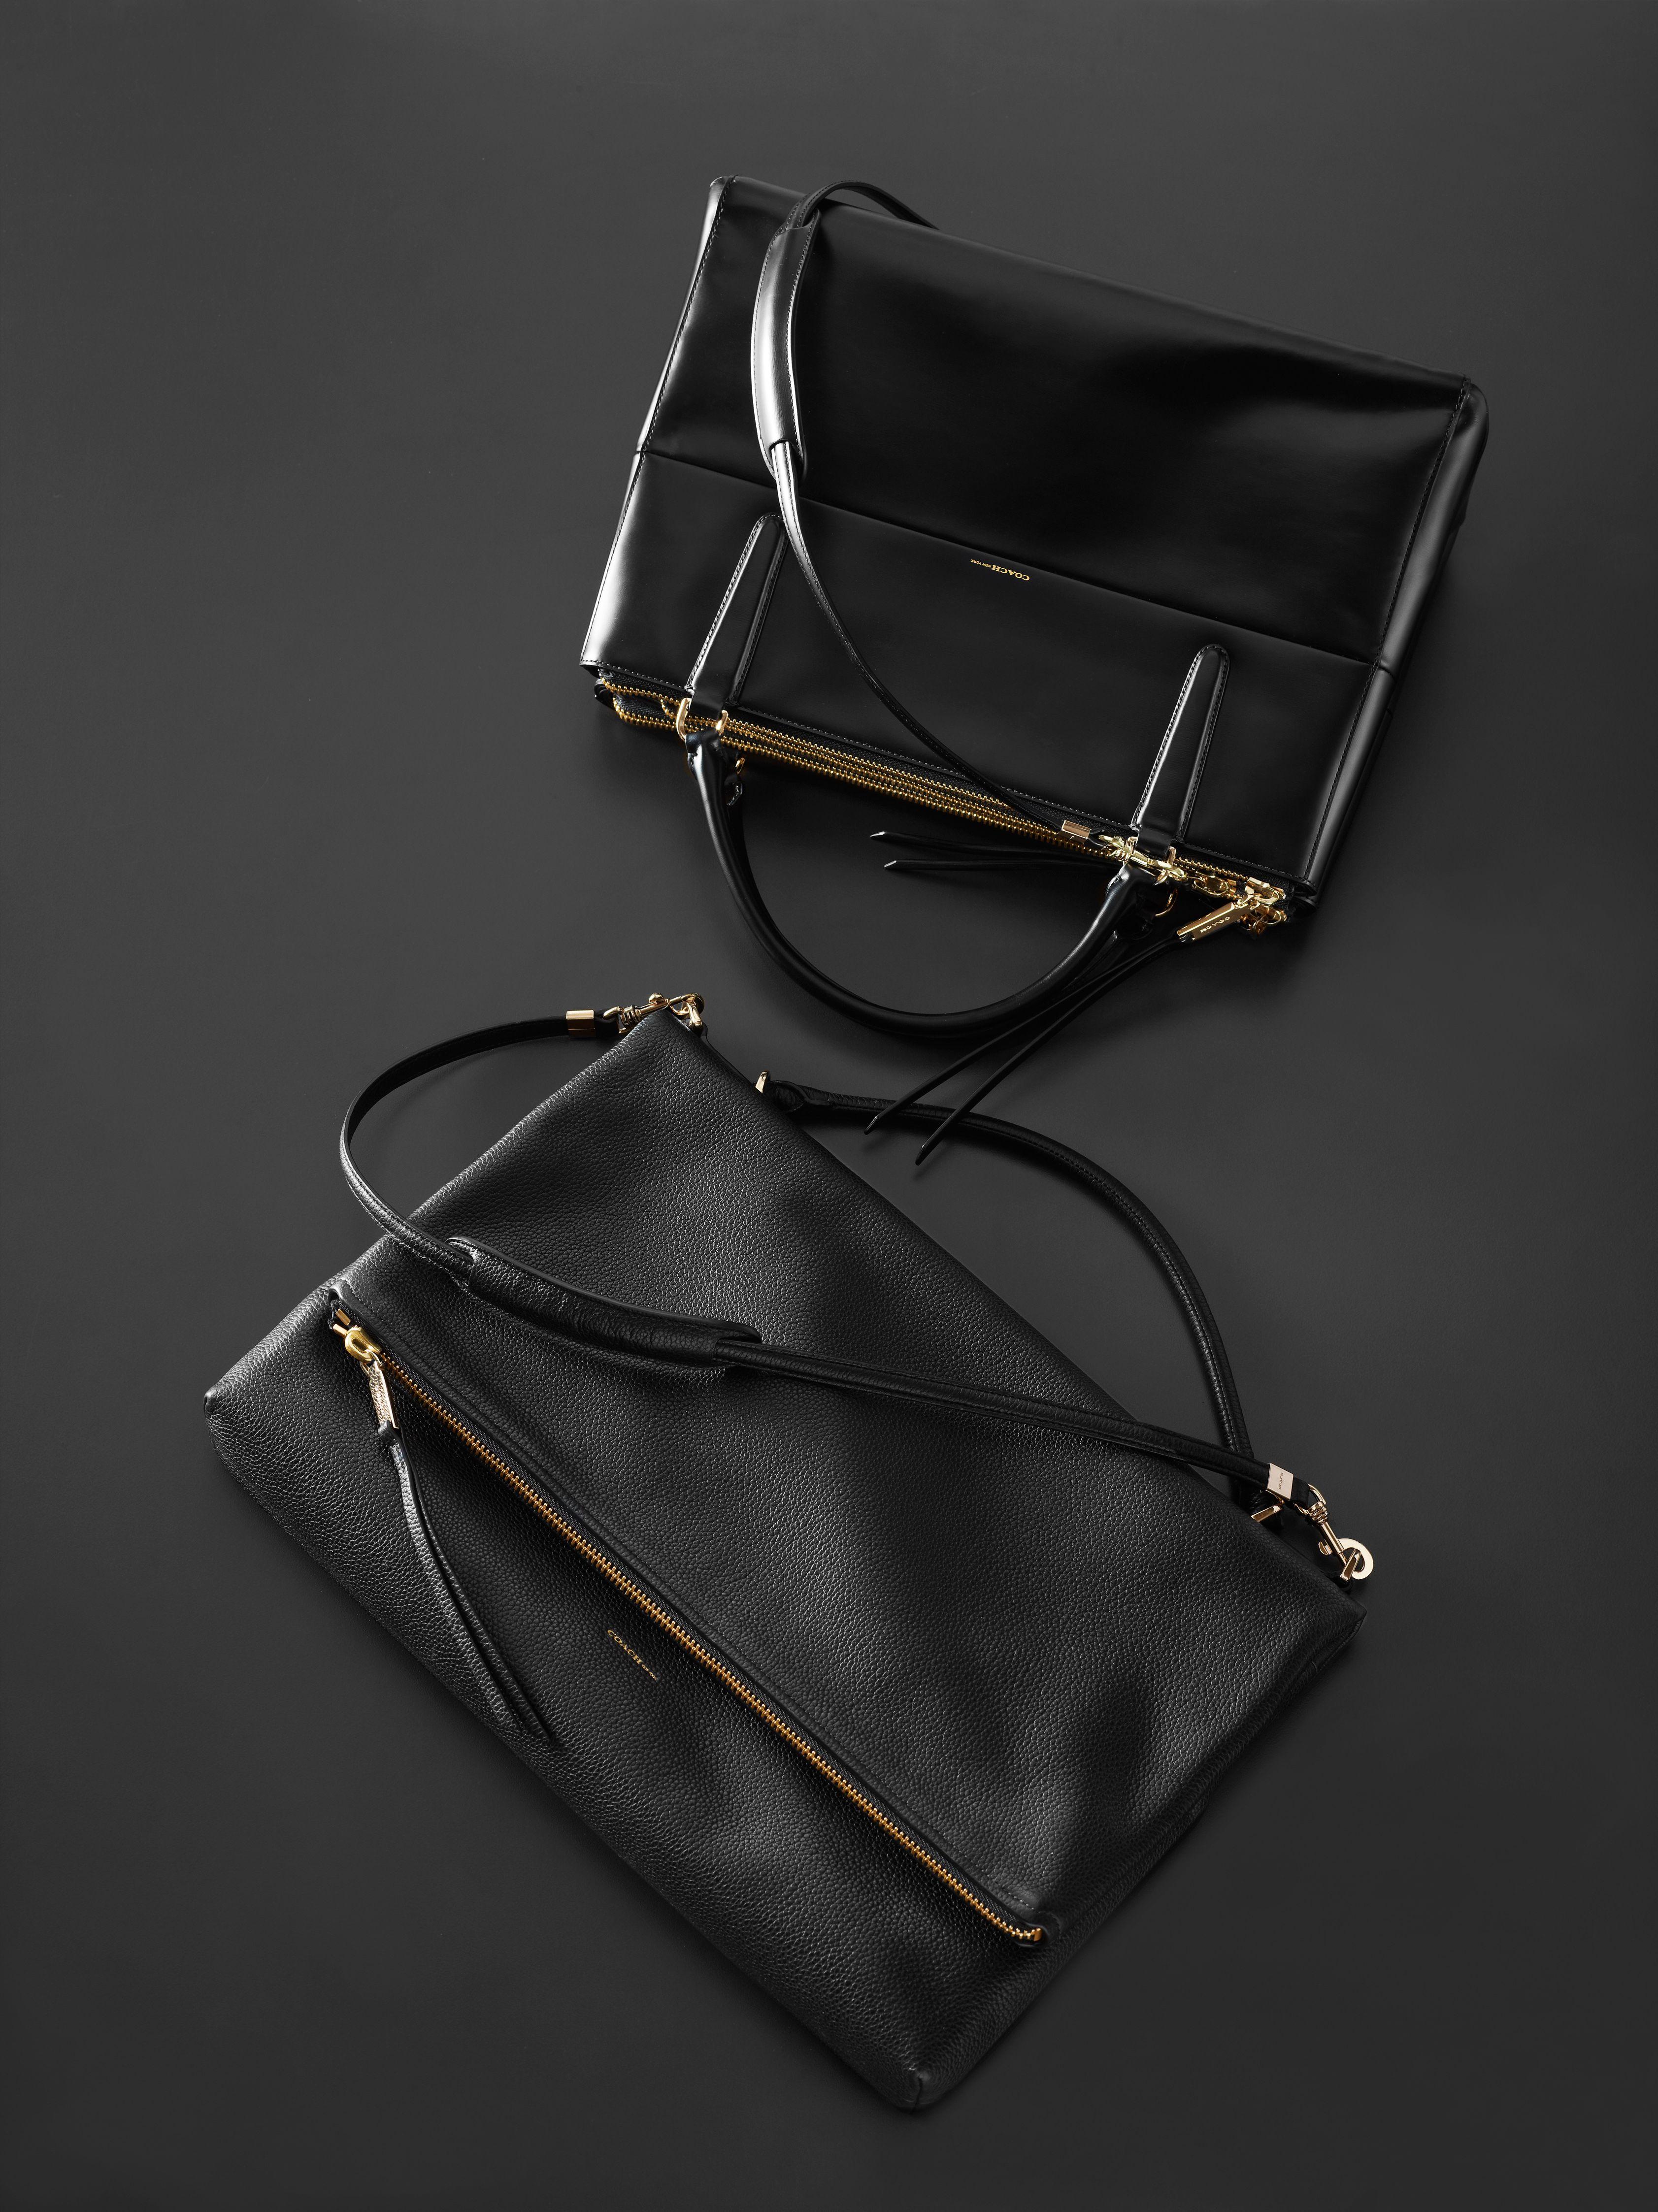 d9d92bd0c7 Genuine Coach Bleeker Flap Leather Shoulder Bag Single Braided Adjustable  Strap only  39.99